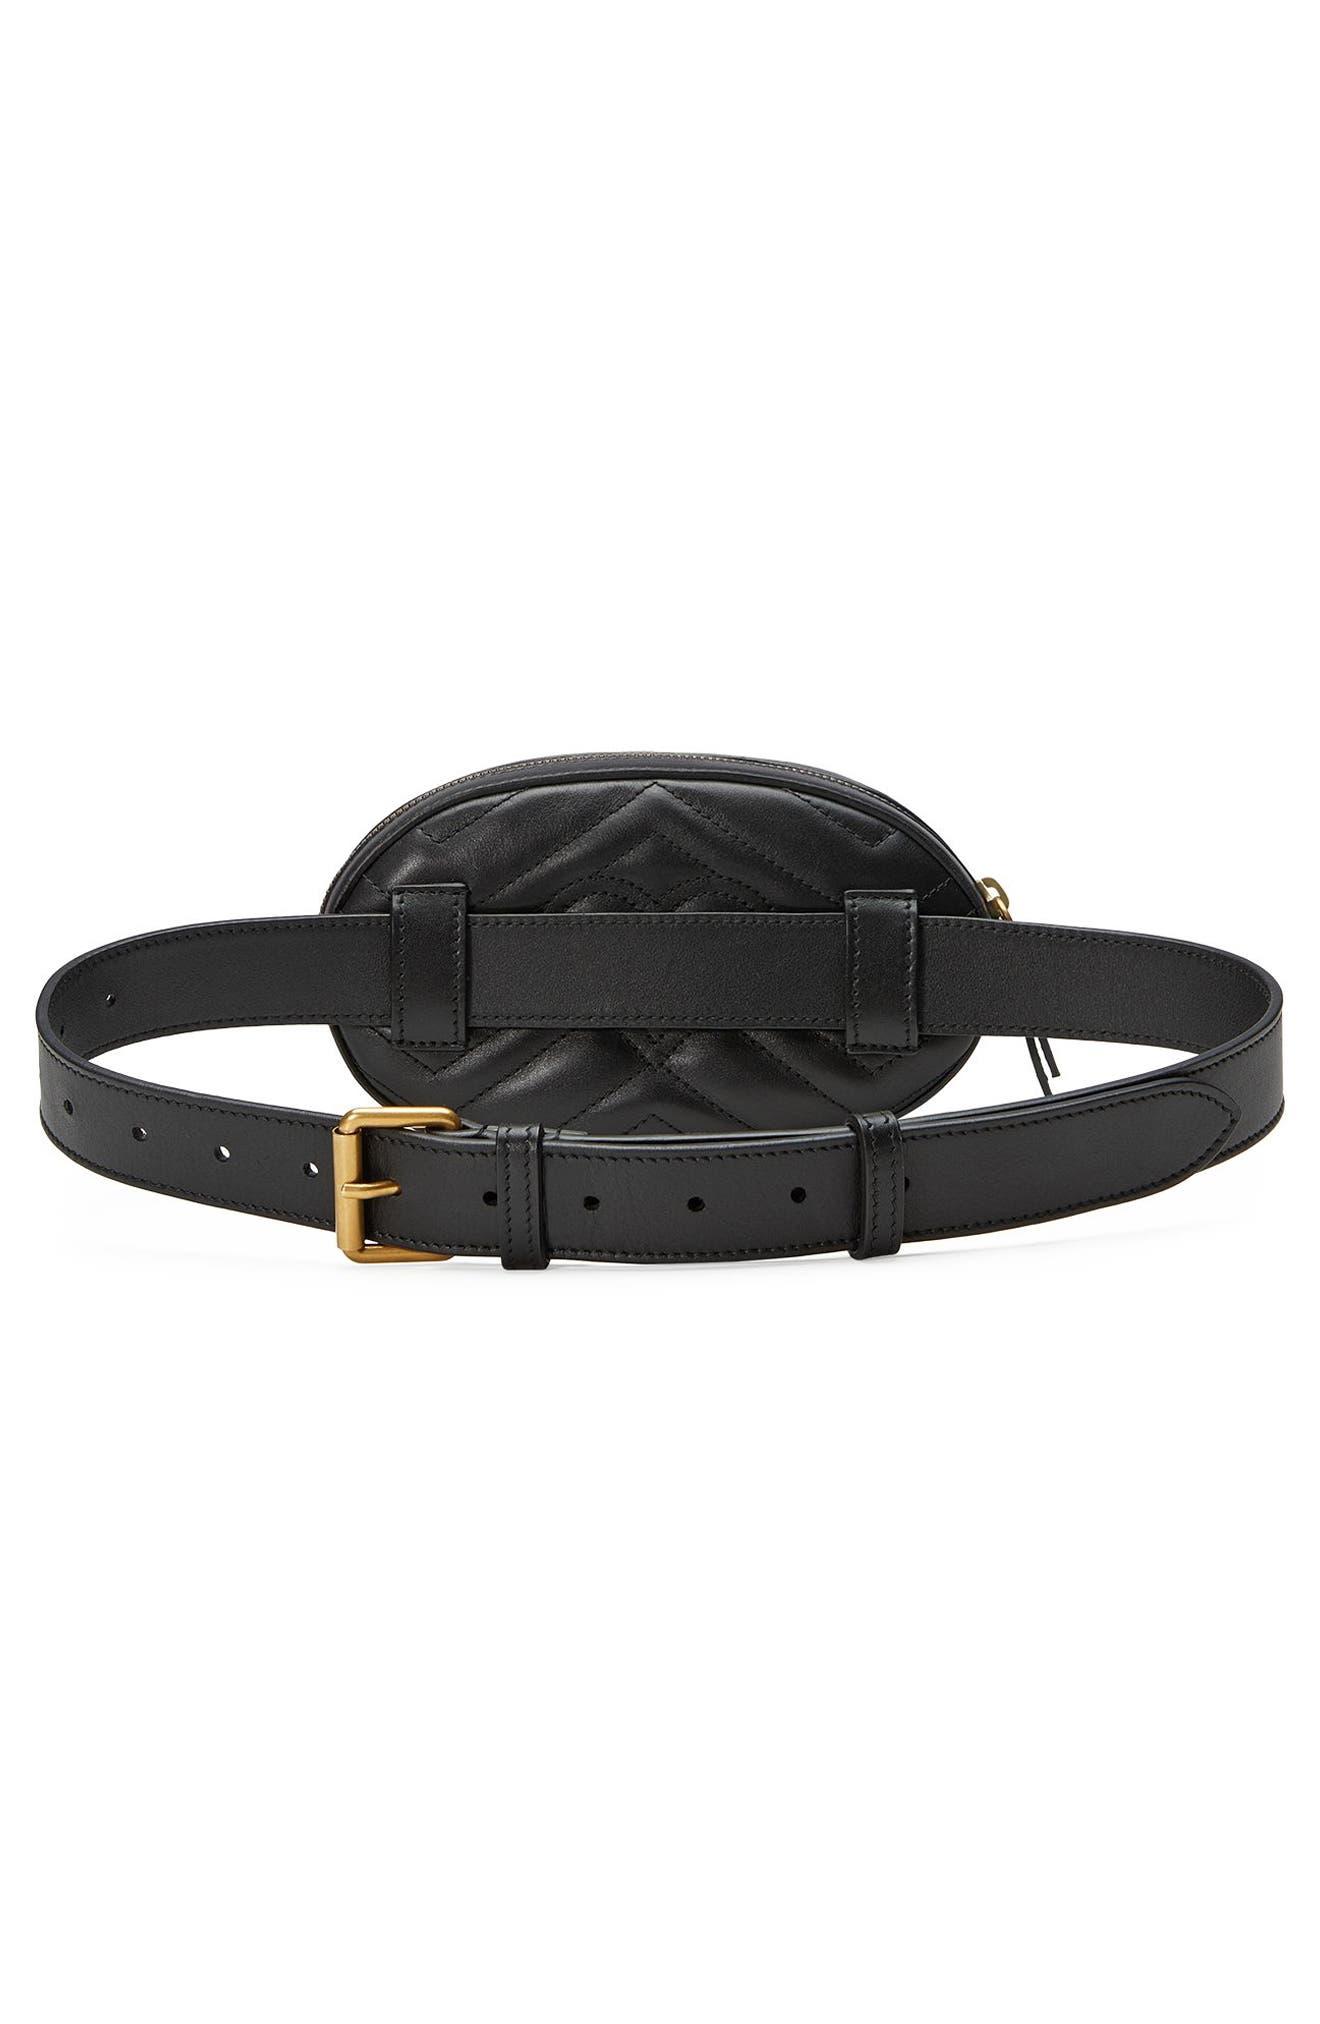 GG Marmont 2.0 Animal Stud Matelassé Leather Belt Bag,                             Alternate thumbnail 2, color,                             001